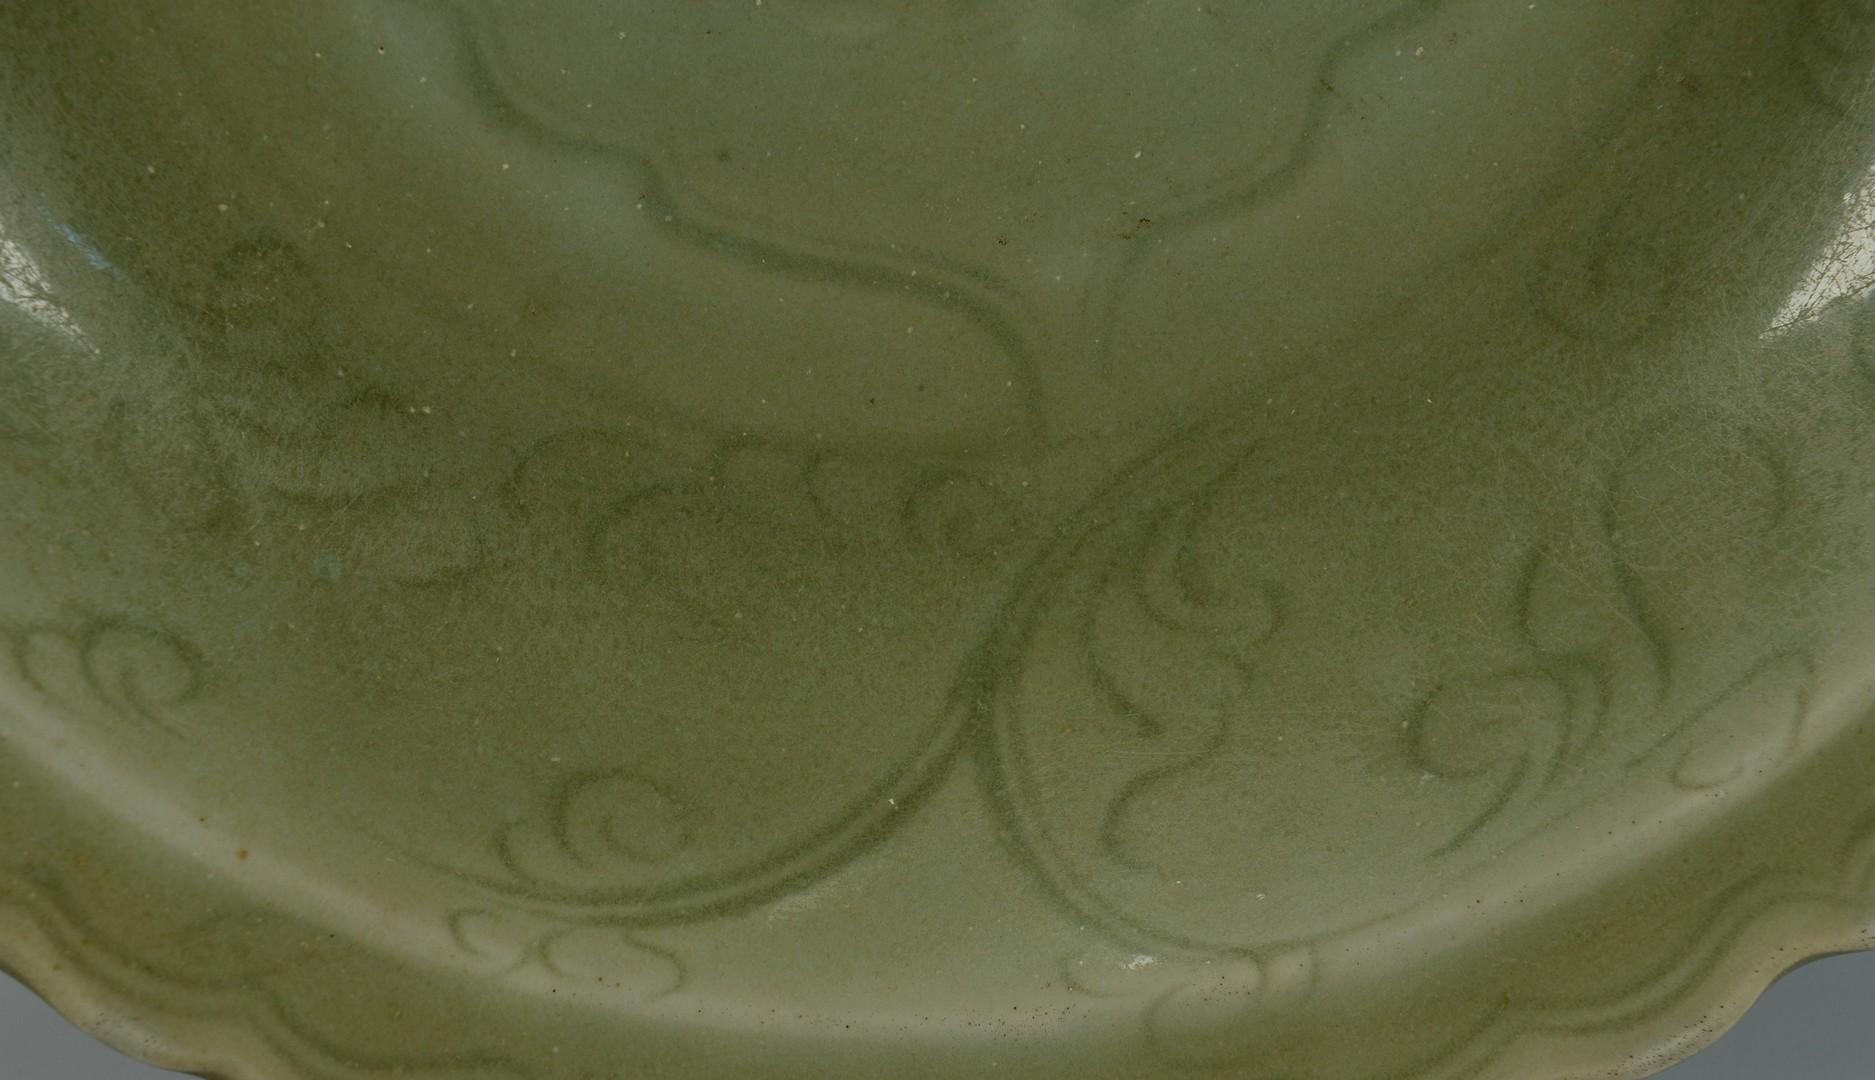 Lot 3383221: Chinese Ming Celadon Plate